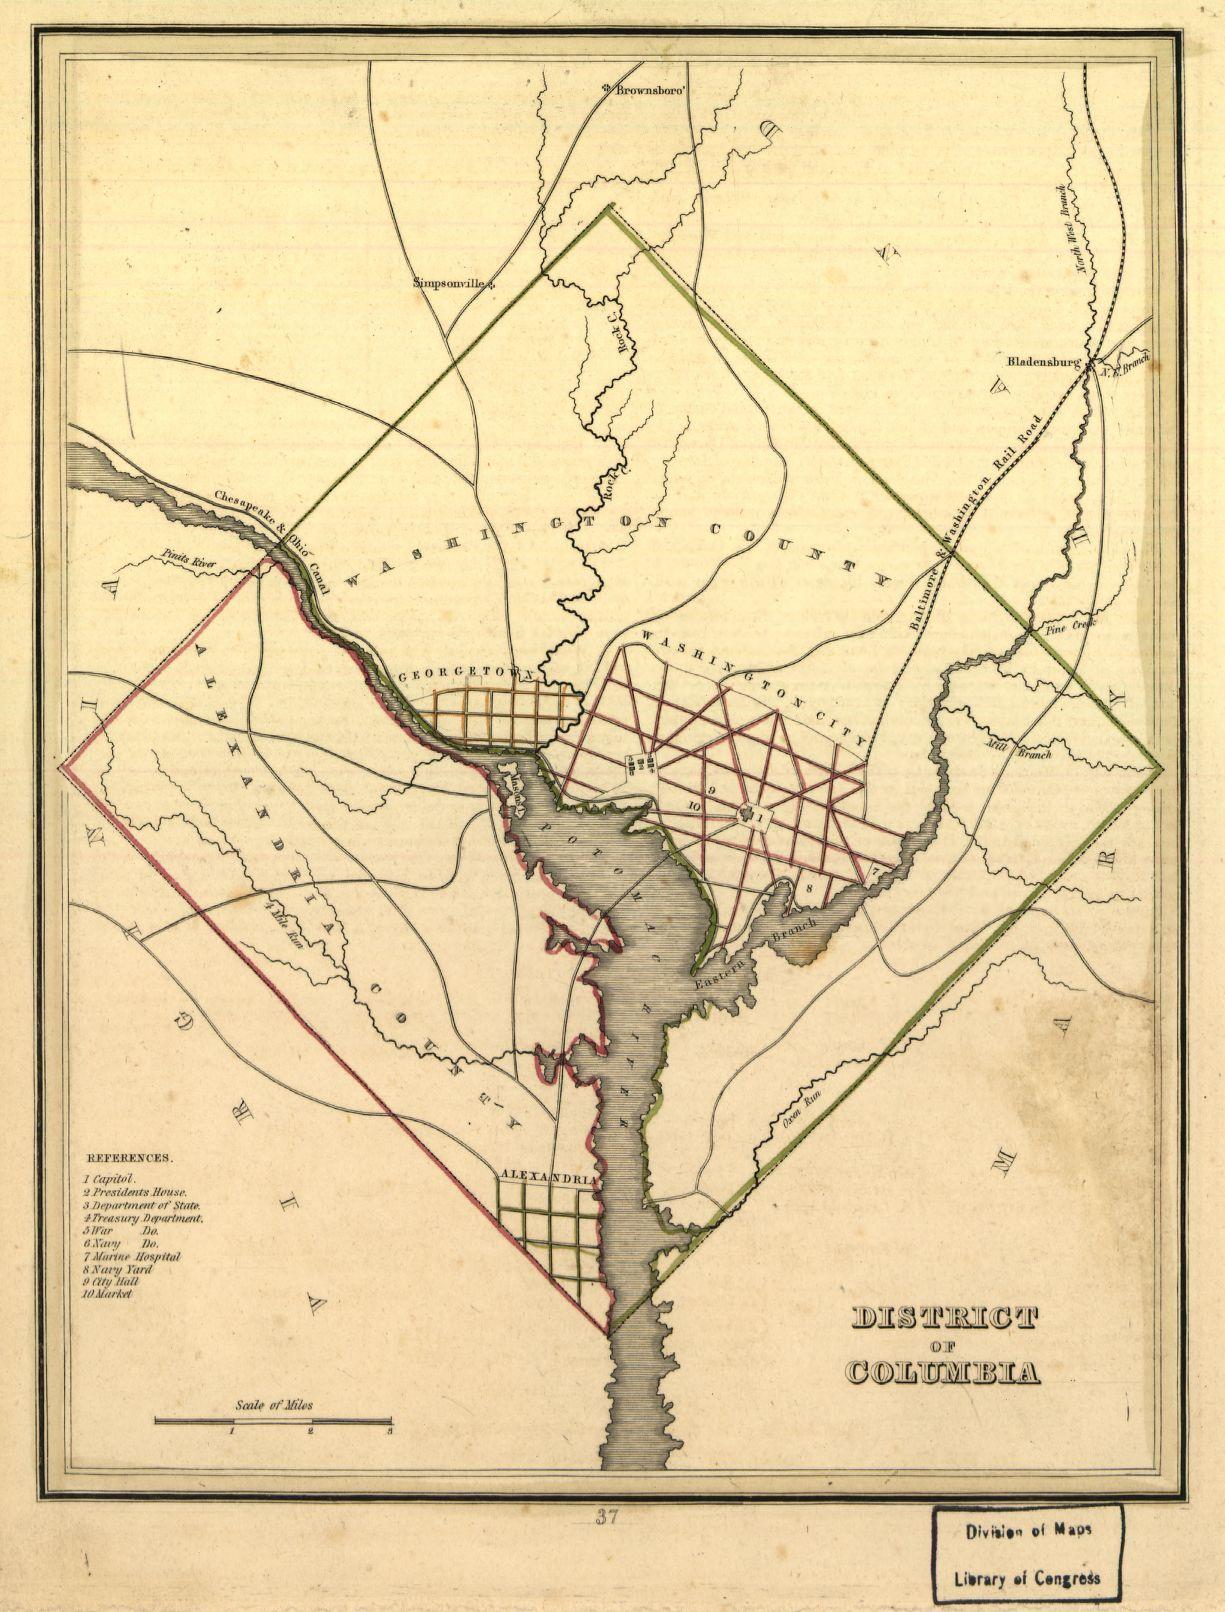 1835 Map Of Washington Dc Ads Classifieds Washington Dc Map - Washington-dc-on-a-map-of-the-us